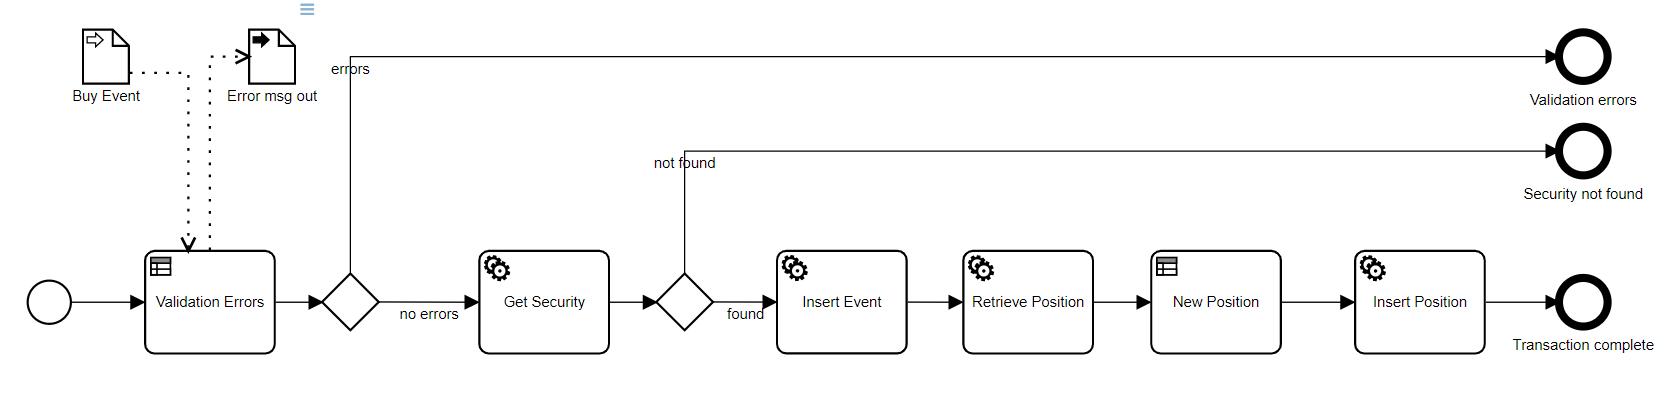 DMN: Validating Input Data